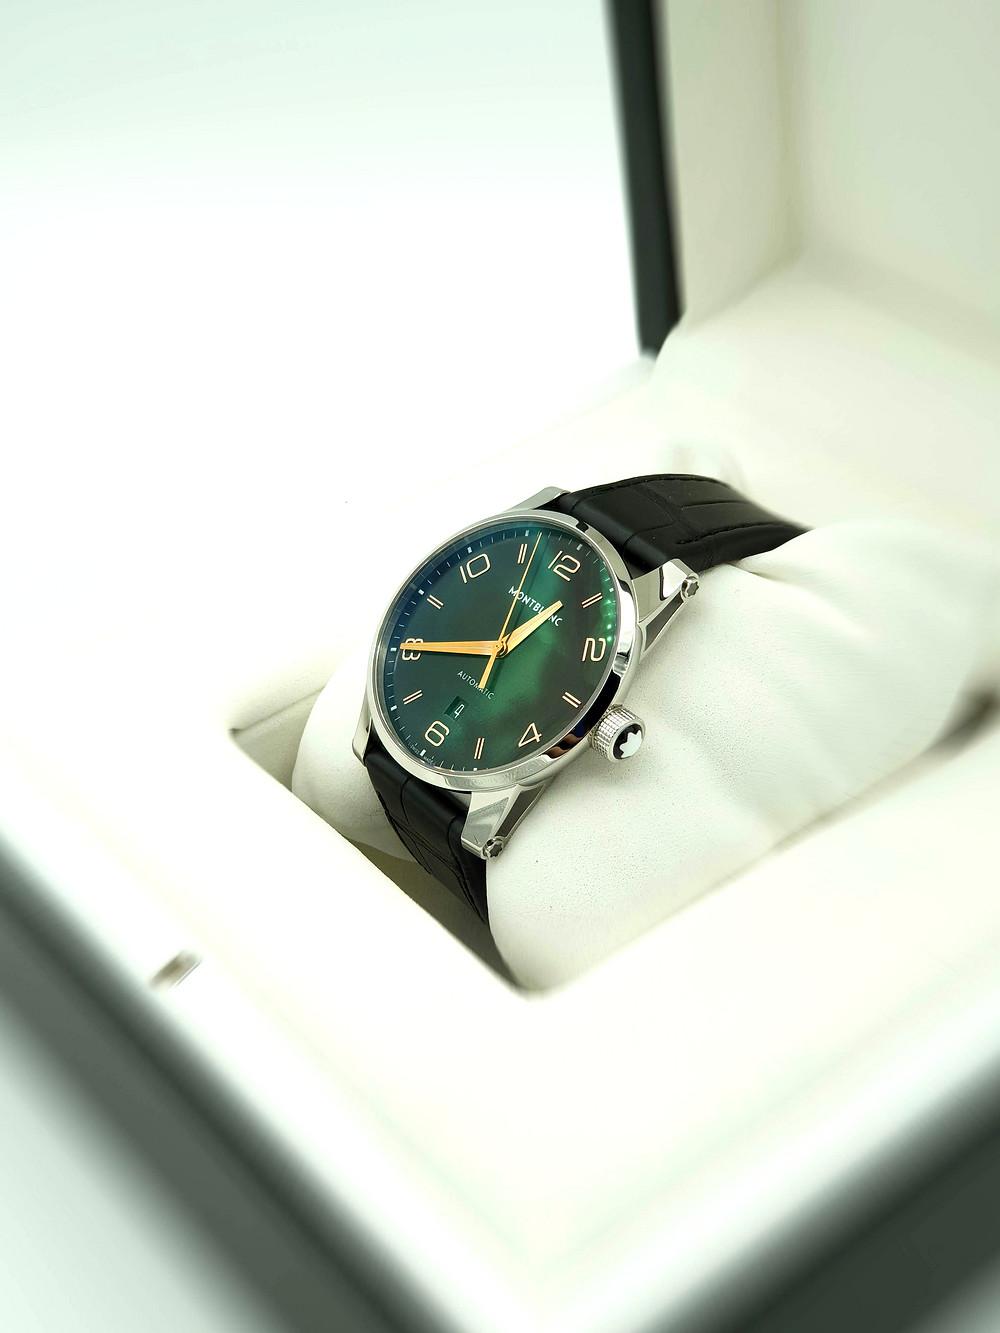 Hire a Montblanc Timewalker watch from WatchVIP